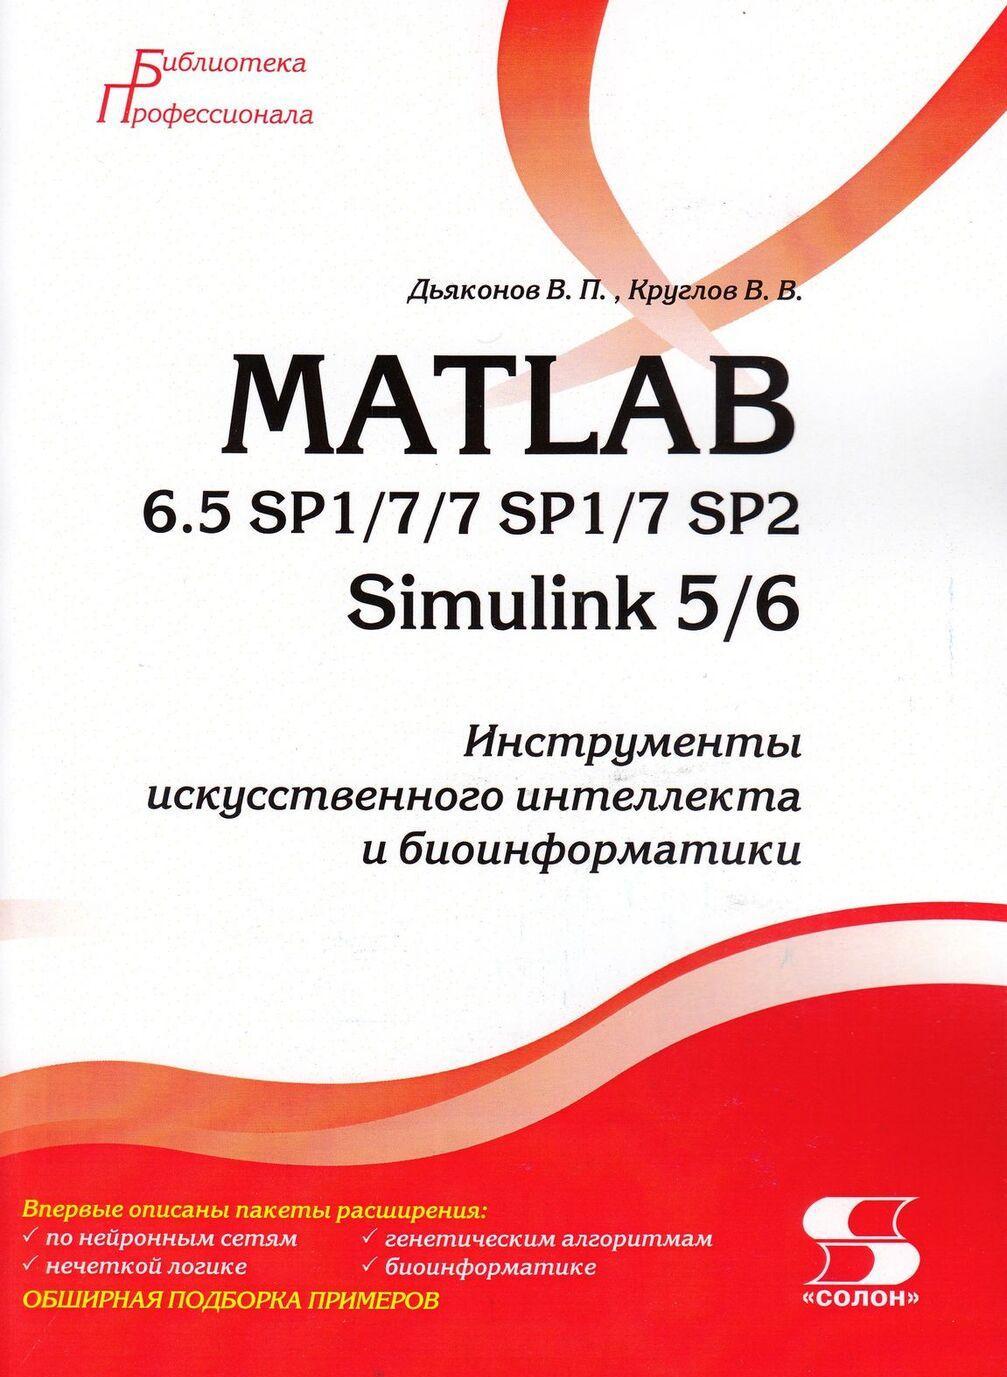 MATLAB 6.5 SP1/7/7 SP1/7 SP2 + Simulink 5/6. Instrumenty iskusstvennogo intellekta i bioinformatiki